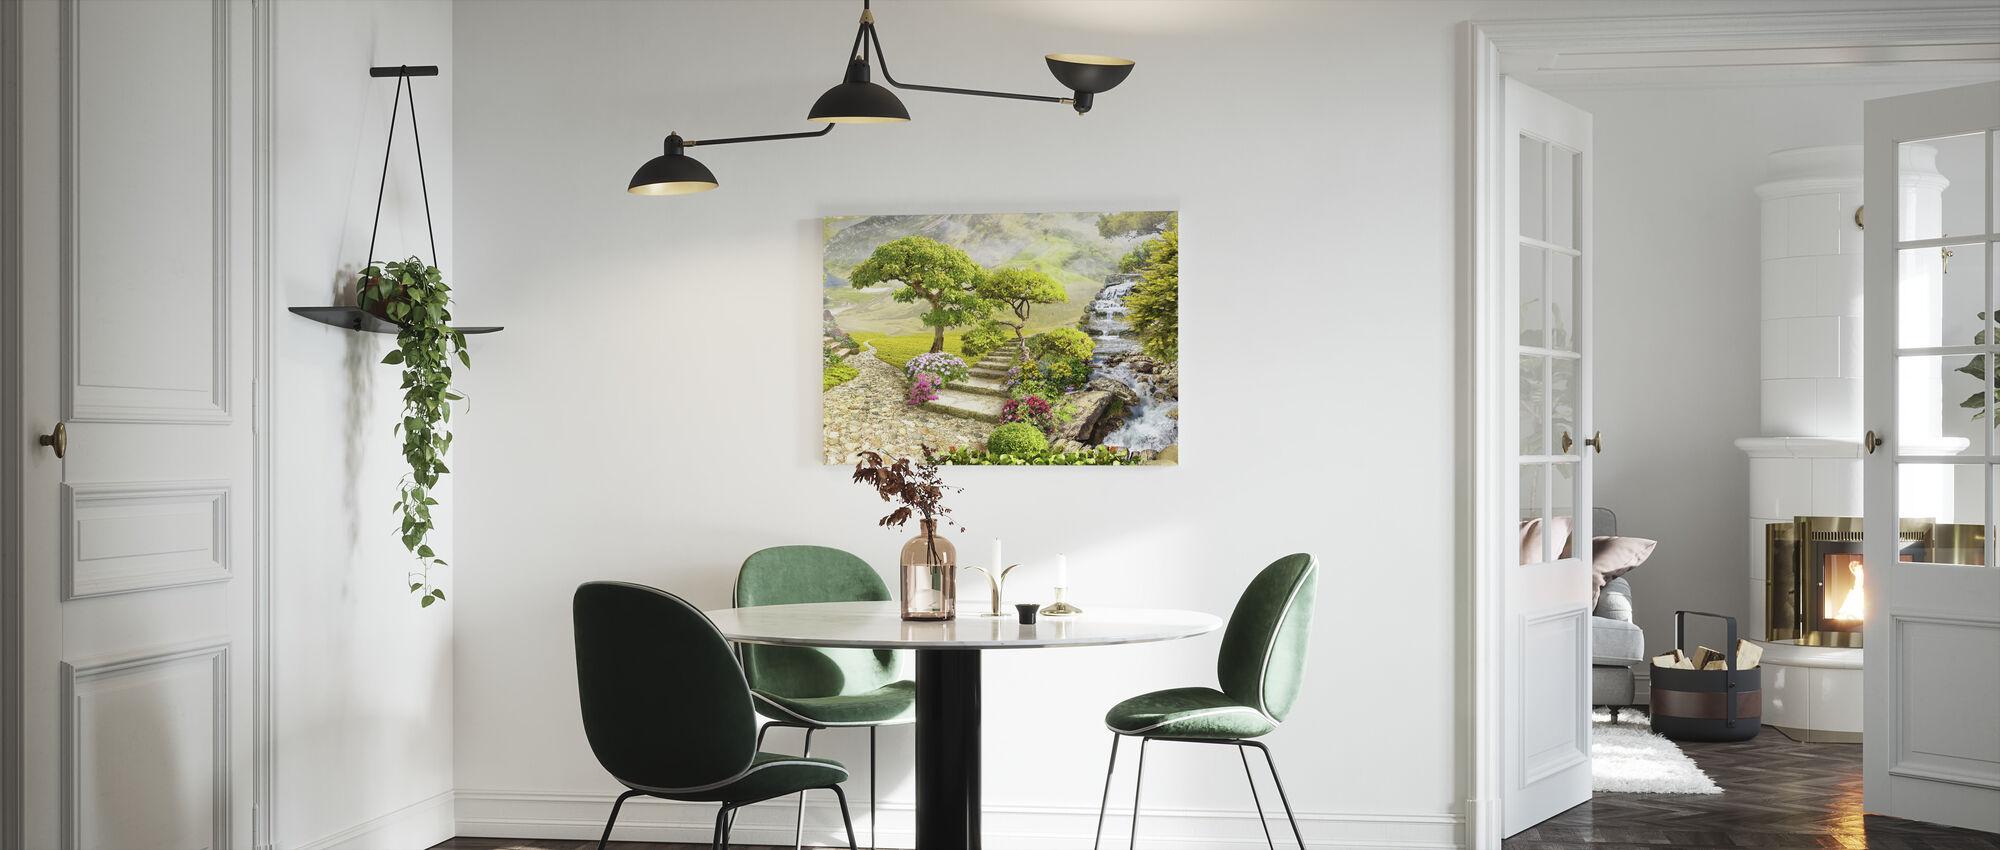 Watervallen in Tuin - Canvas print - Keuken